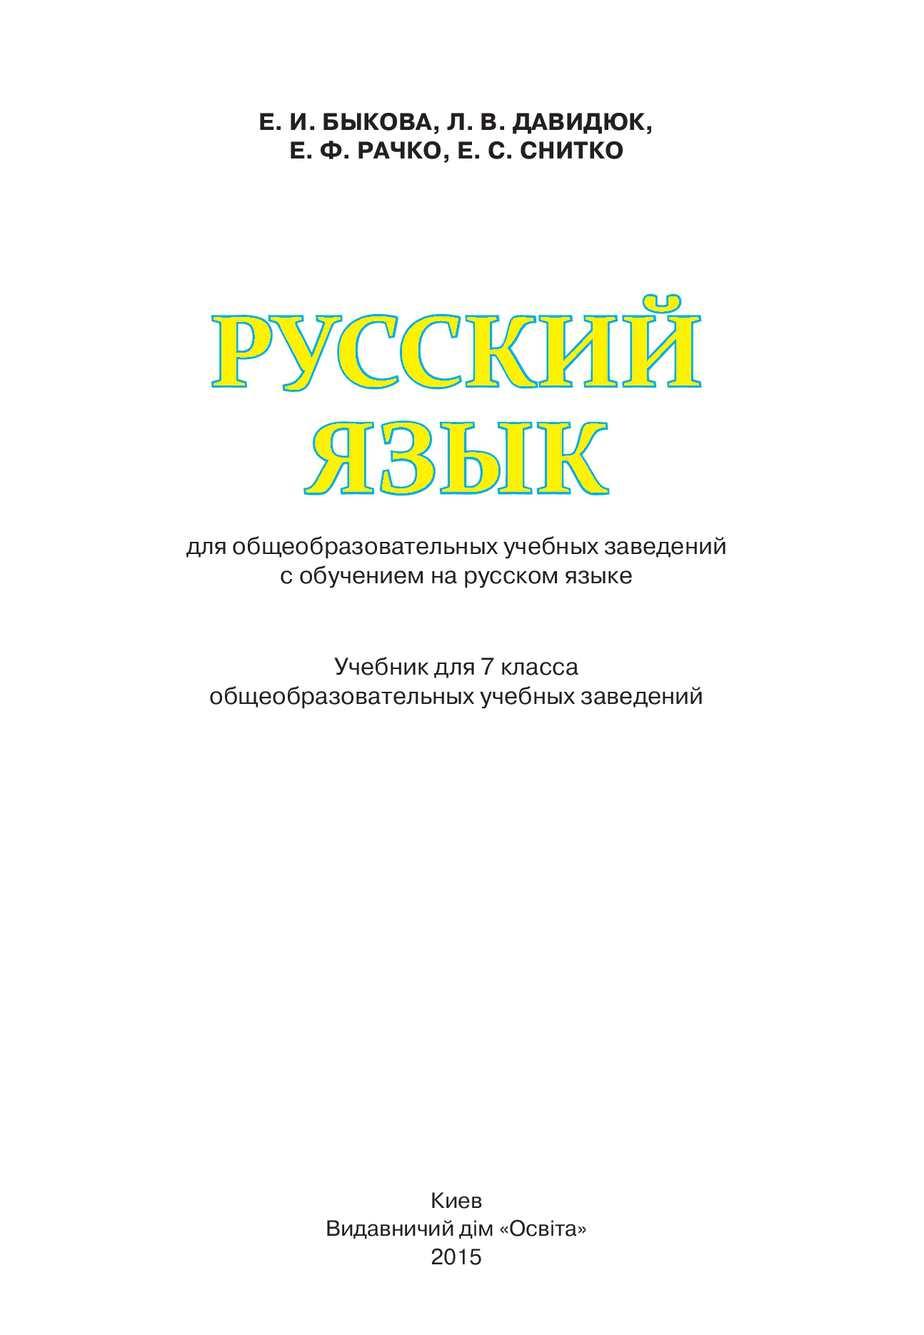 Гдз по русскому языку снитко